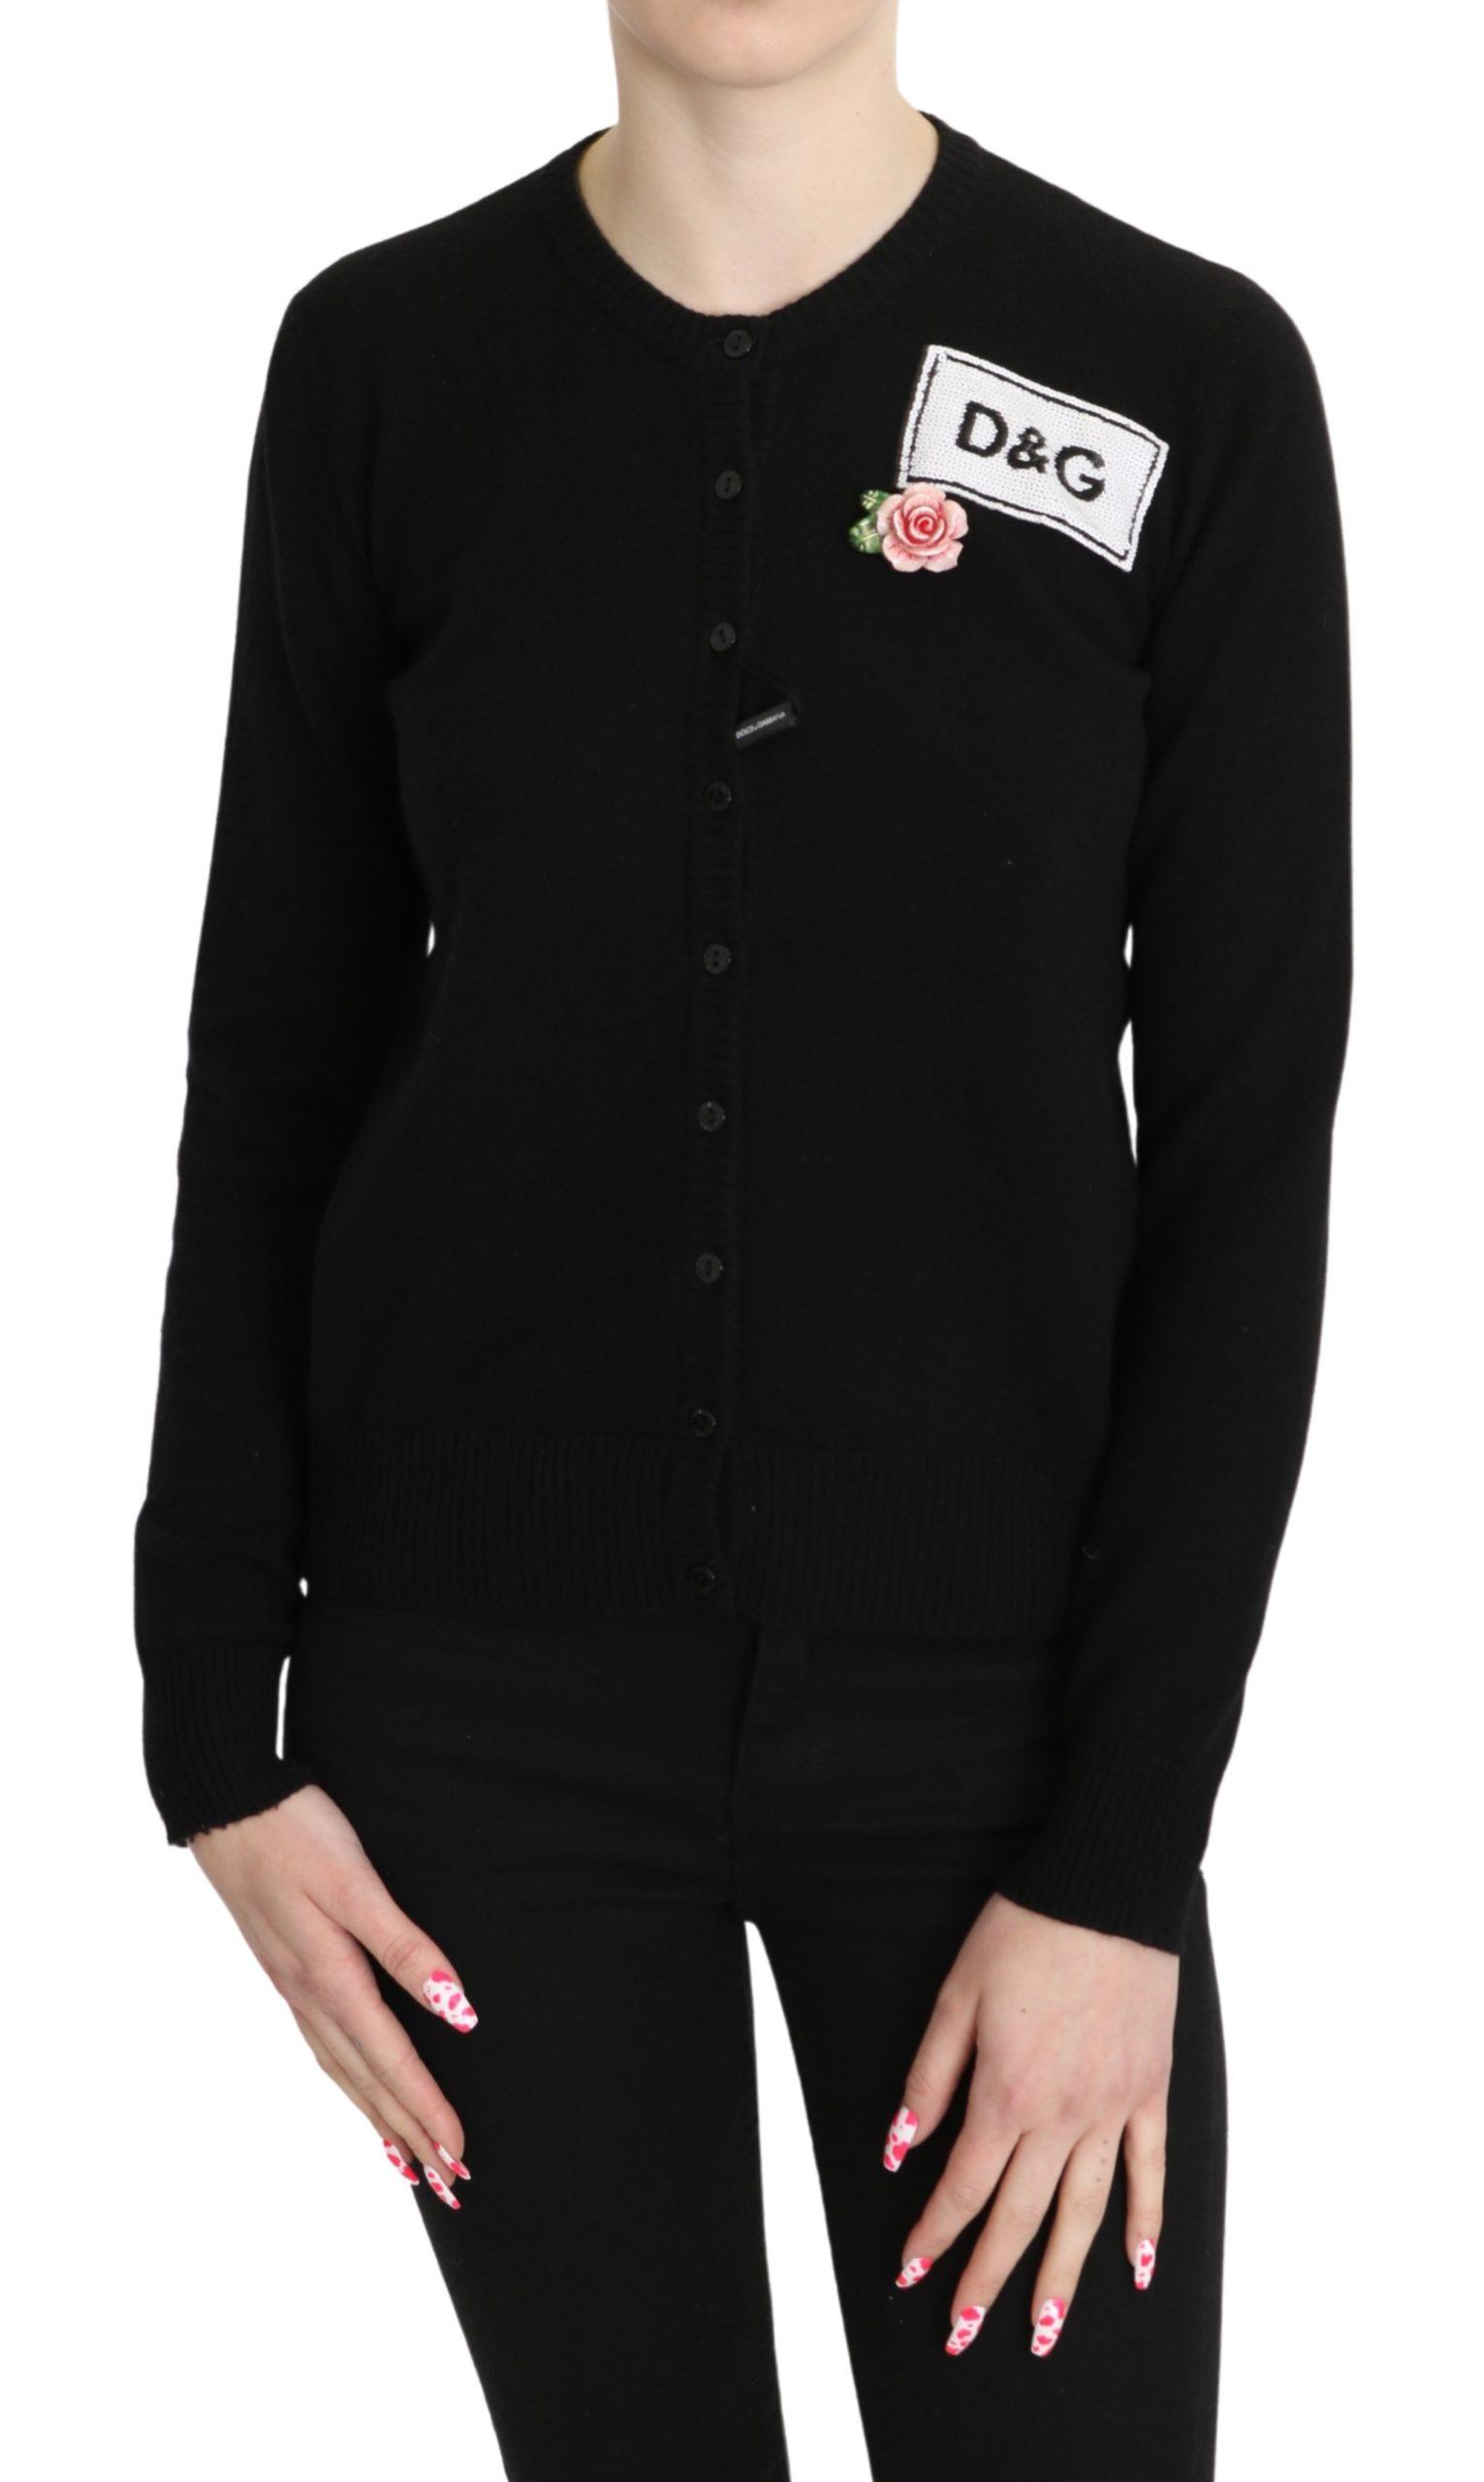 Dolce & Gabbana Women's Cashmere Roses Cardigan Black TSH5242 - IT38|XS